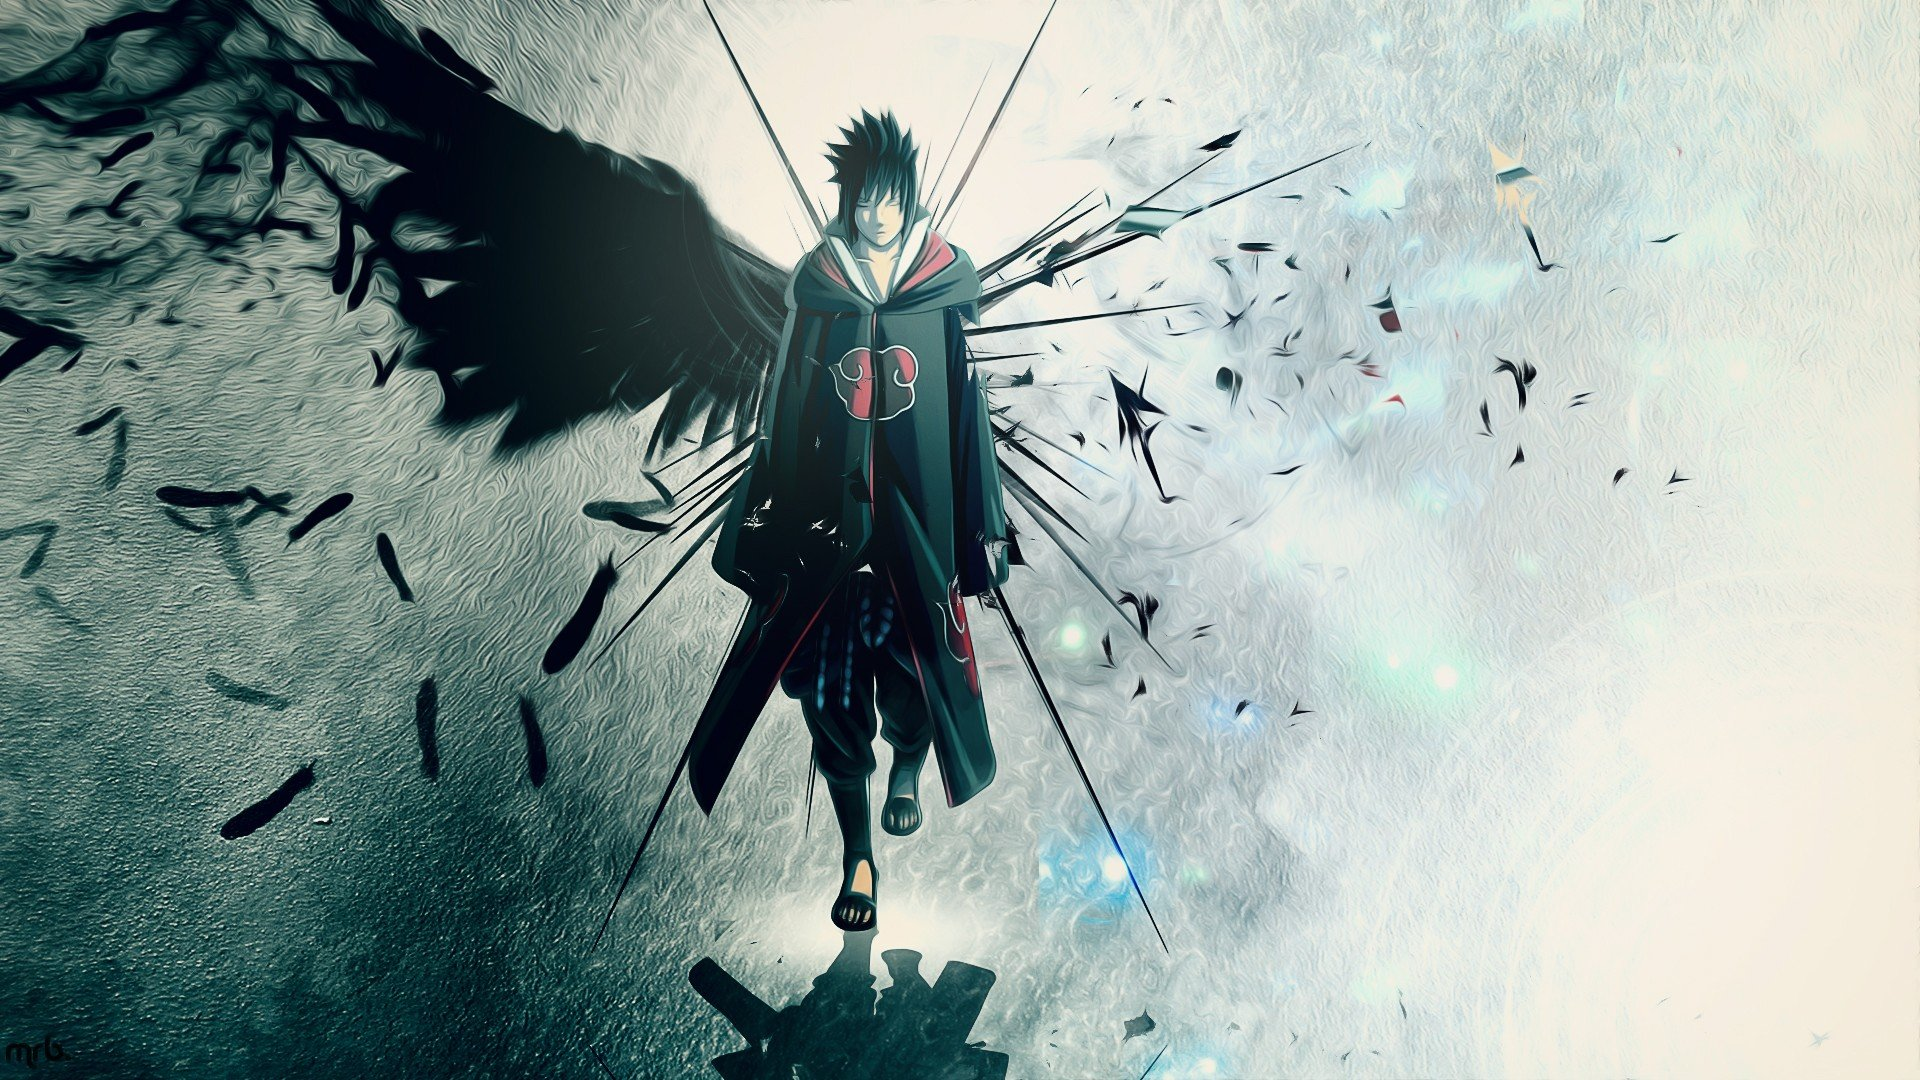 Wings Uchiha Sasuke Naruto Shippuden Akatsuki feathers artwork 1920x1080